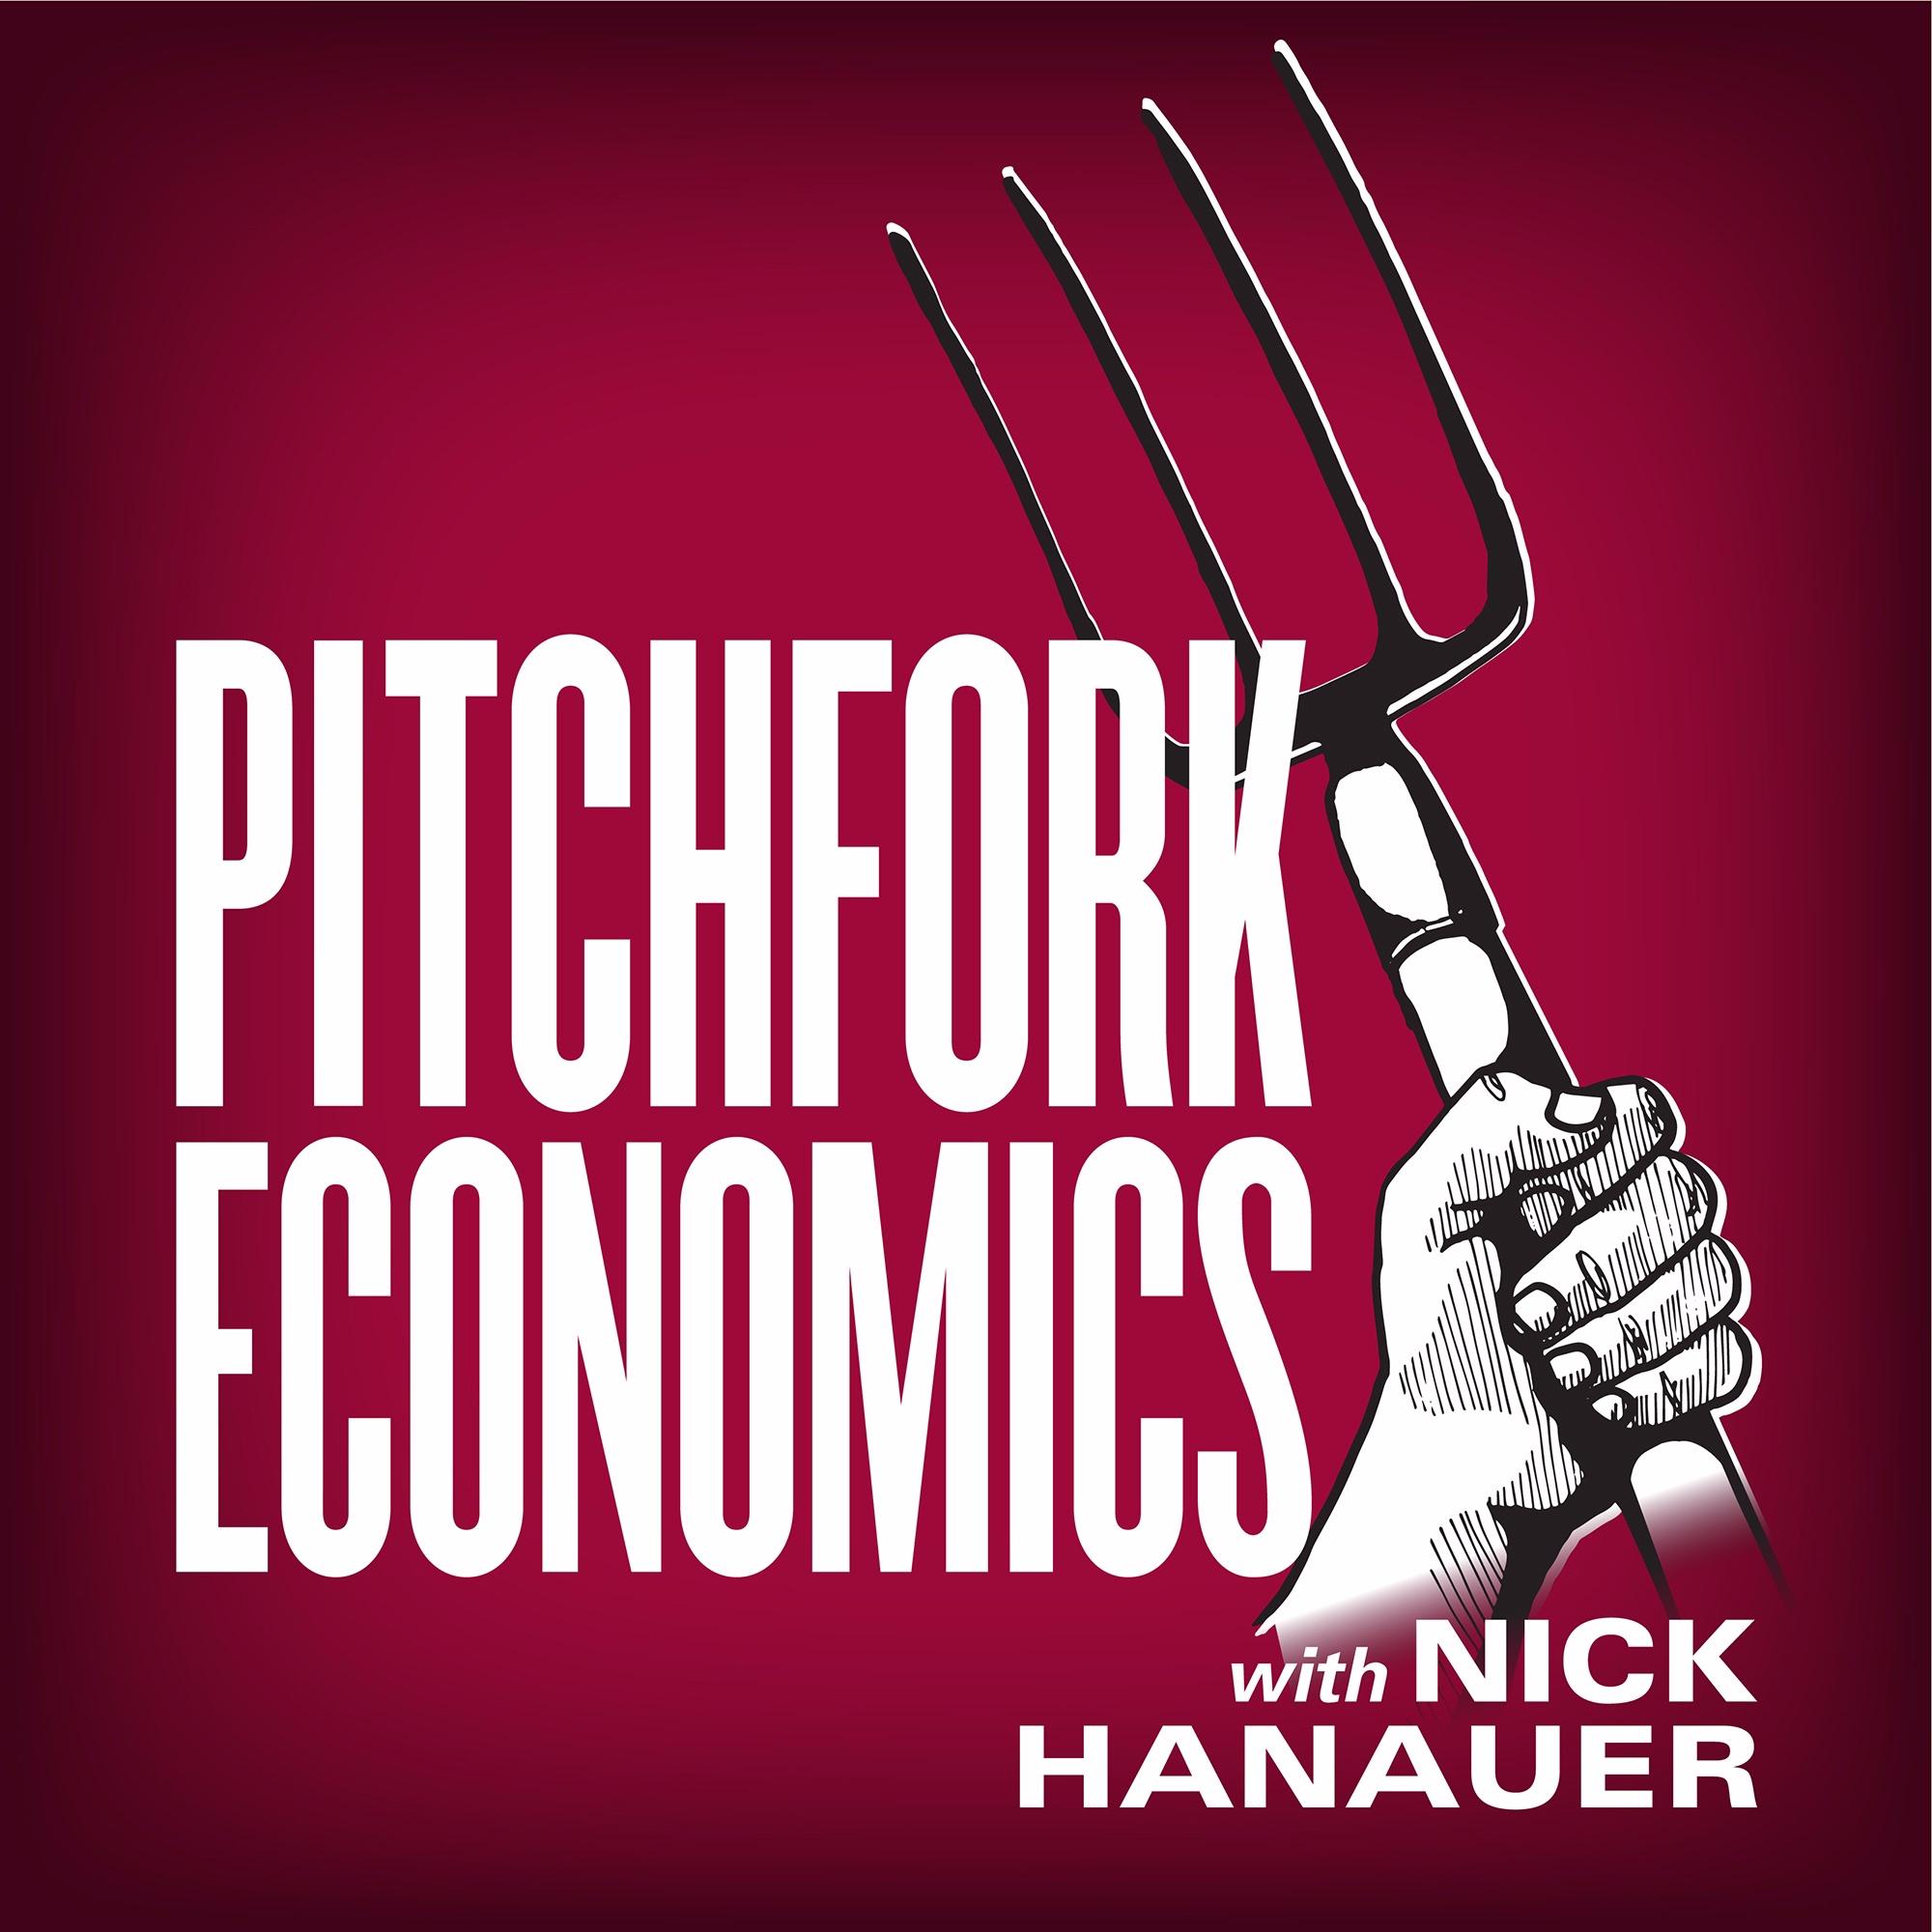 Pitchfork Economics Podcast